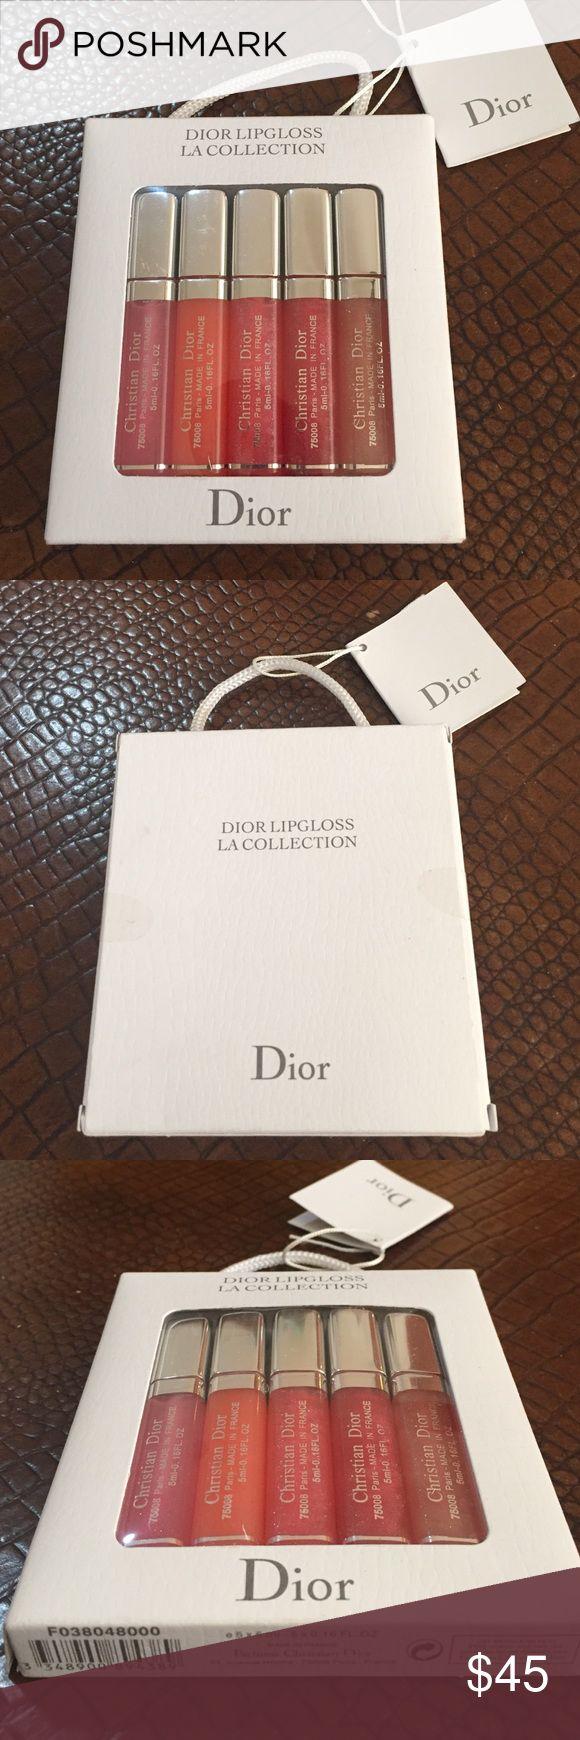 DIOR LIPGLOSS NEW SET LIPGLOSS DIOR Christian Dior Makeup Lip Balm & Gloss